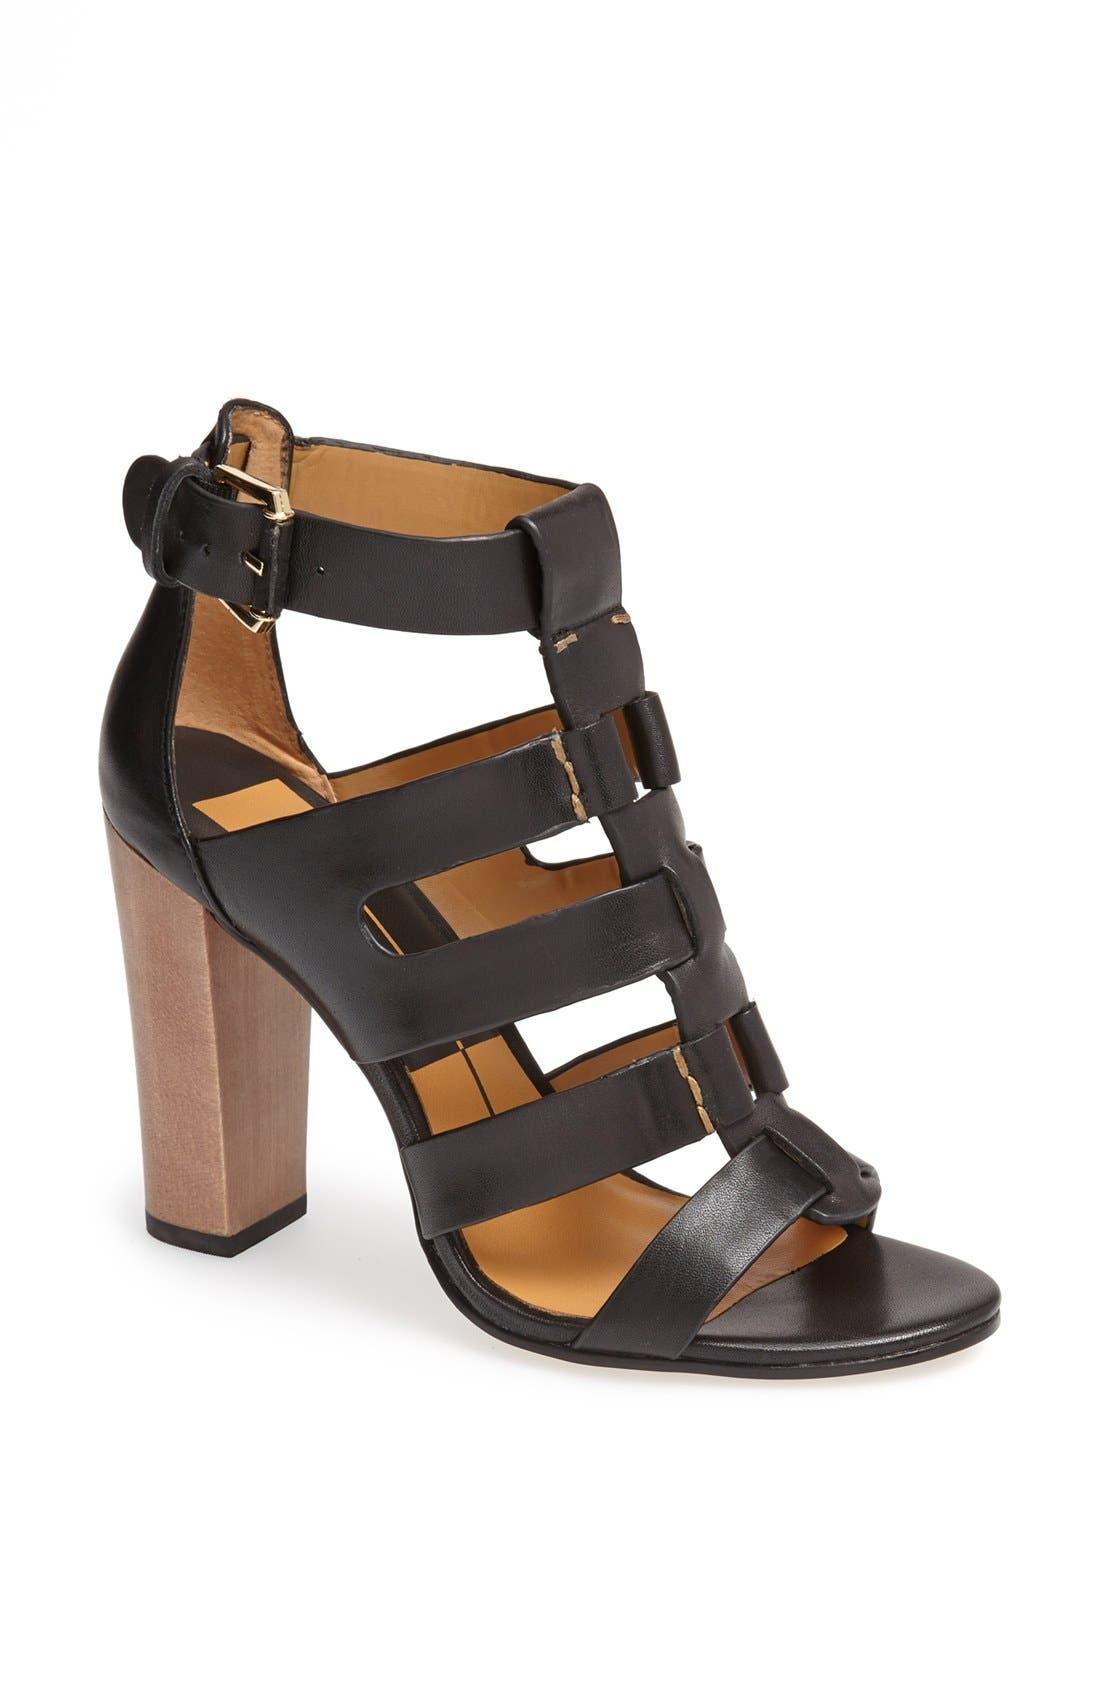 Main Image - Dolce Vita 'Niro' Sandal